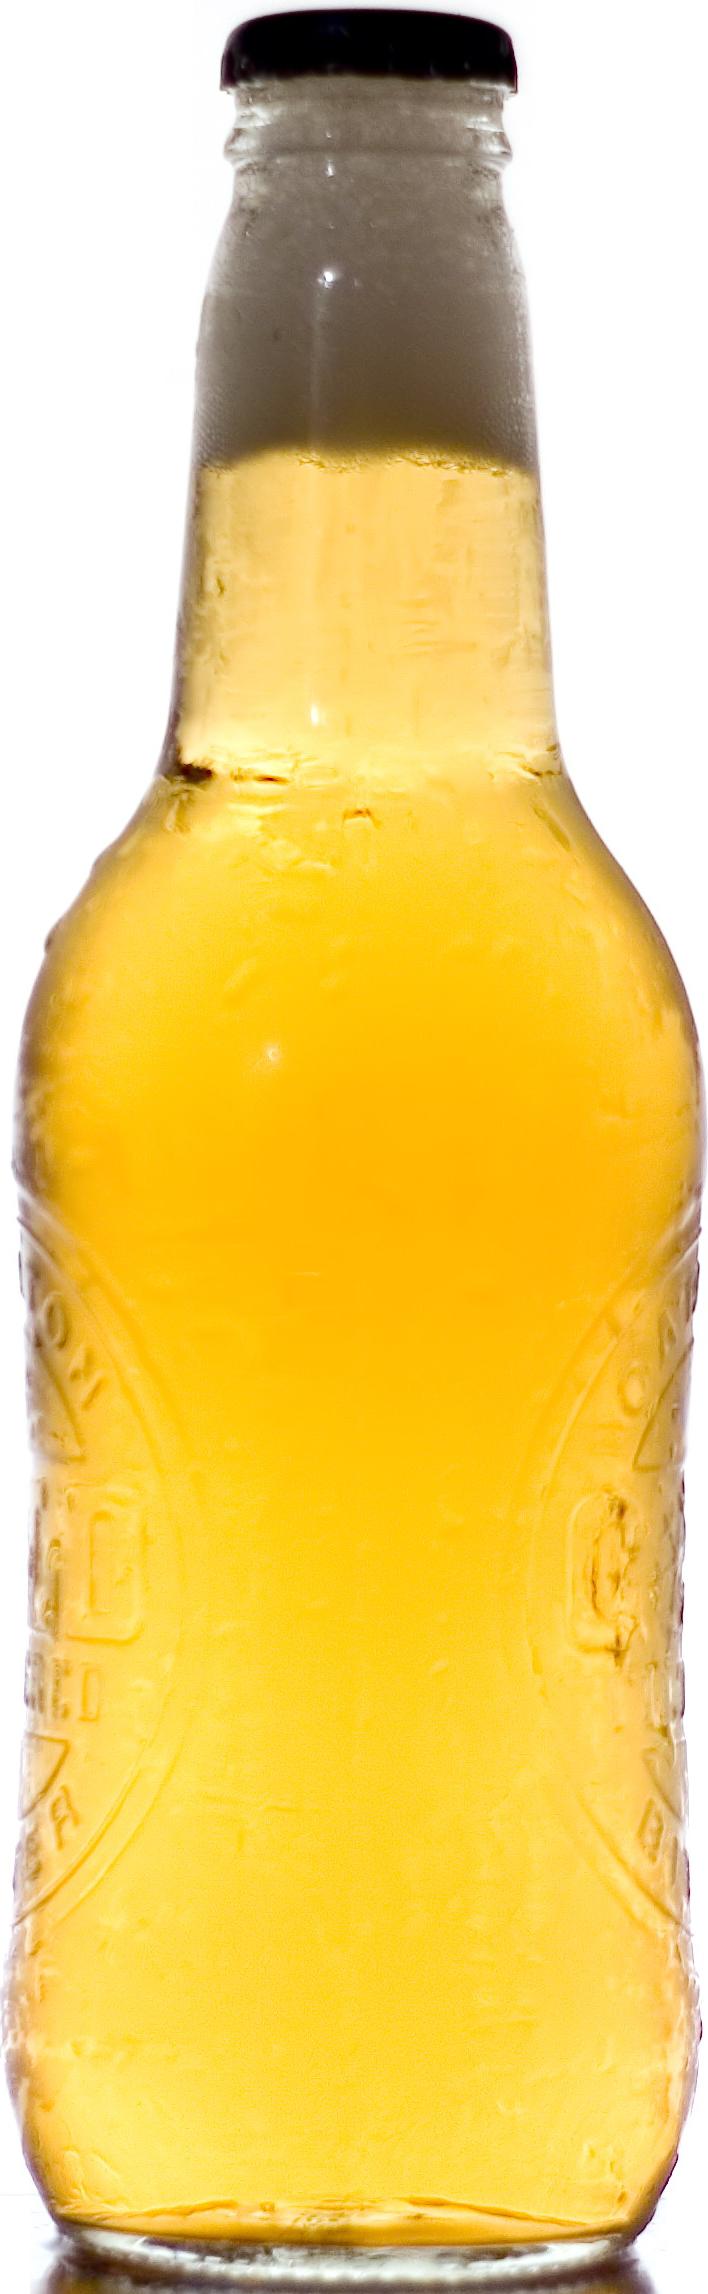 Beer bottle PNG image, download picture - Bottle HD PNG